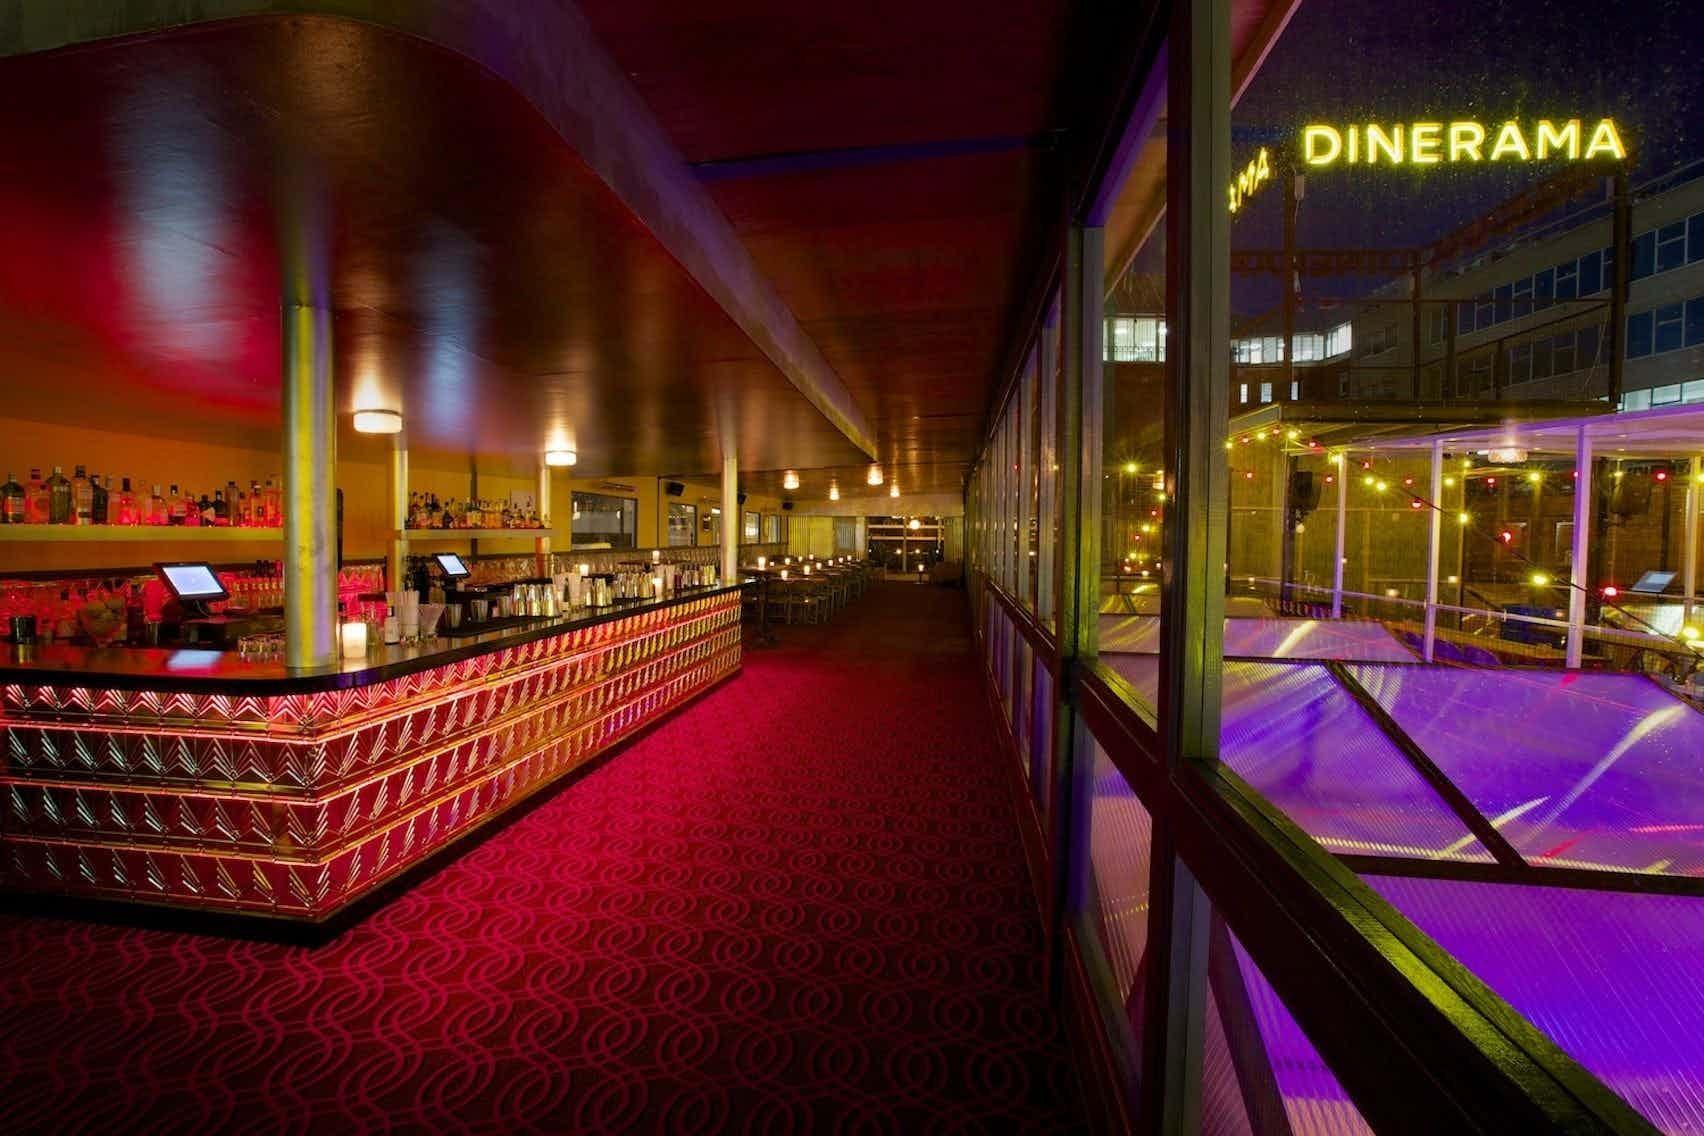 Zephyr Bar, Dinerama